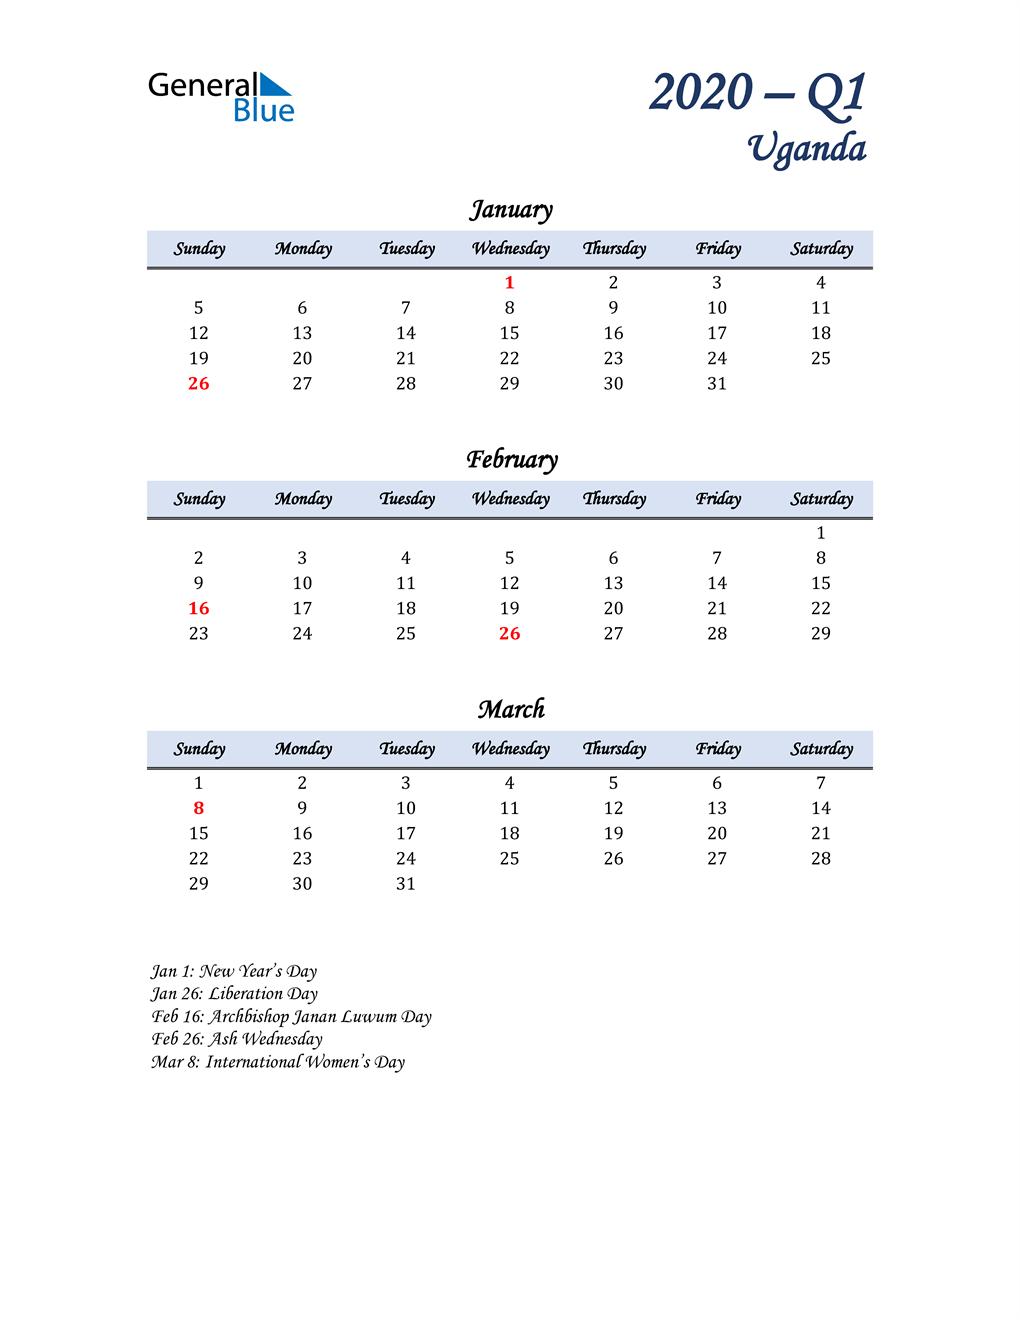 January, February, and March Calendar for Uganda